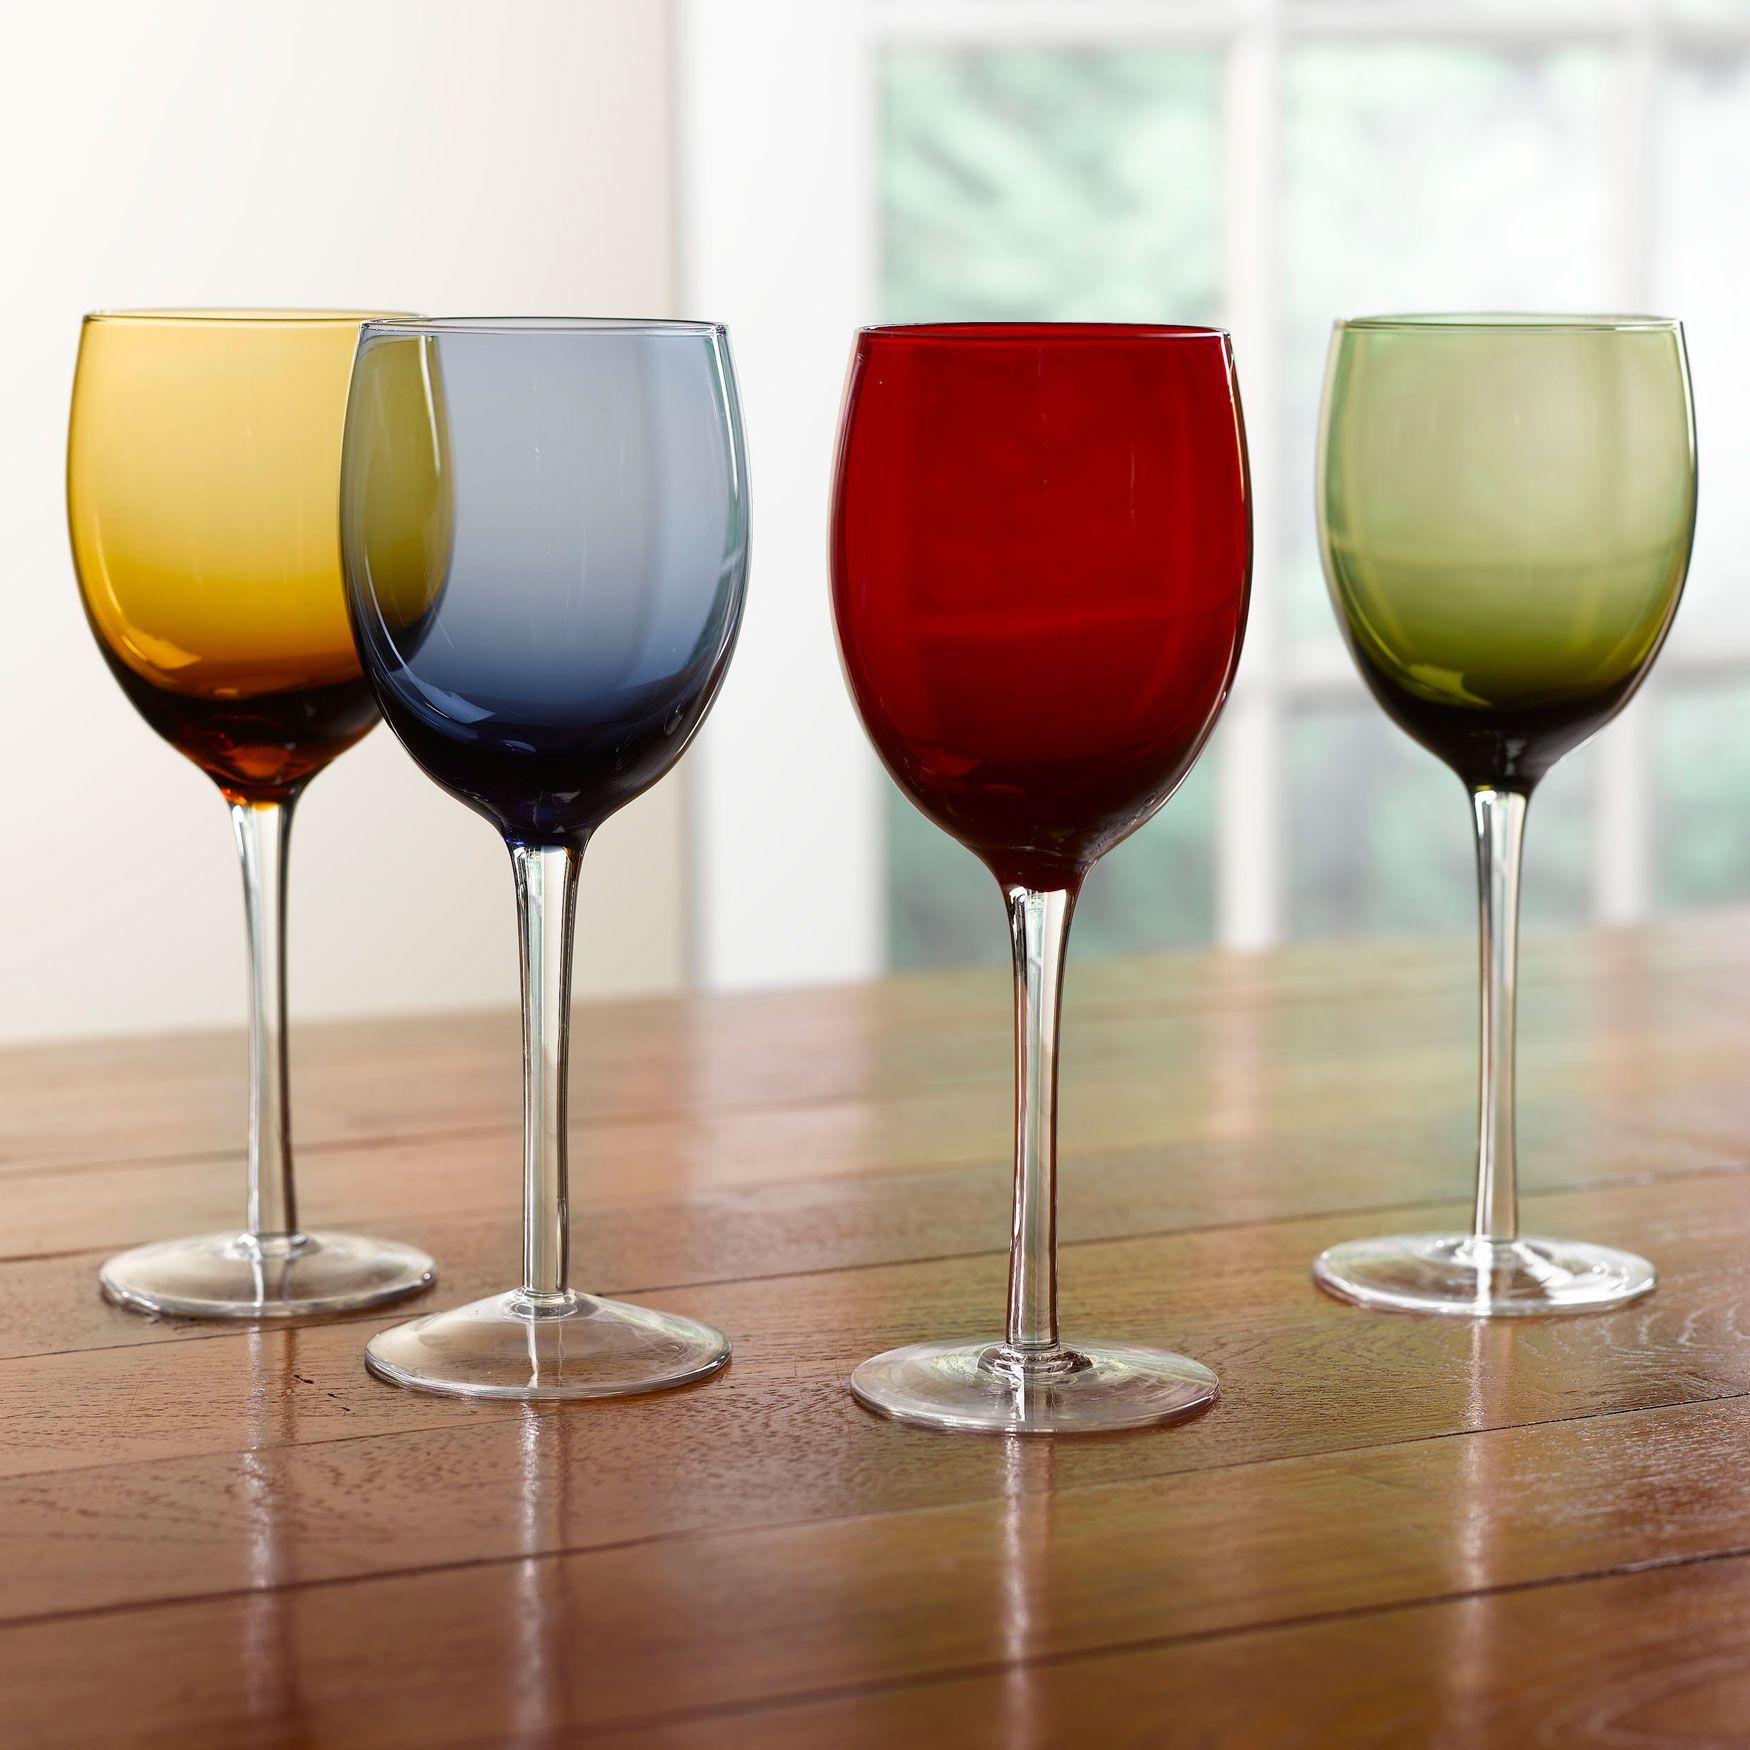 Set Of 4 Jeweltone Glass Goblets Dining Entertaining Brylanehome Indoor Outdoor Furniture Goblet Wine Glasses Colored Wine Glasses